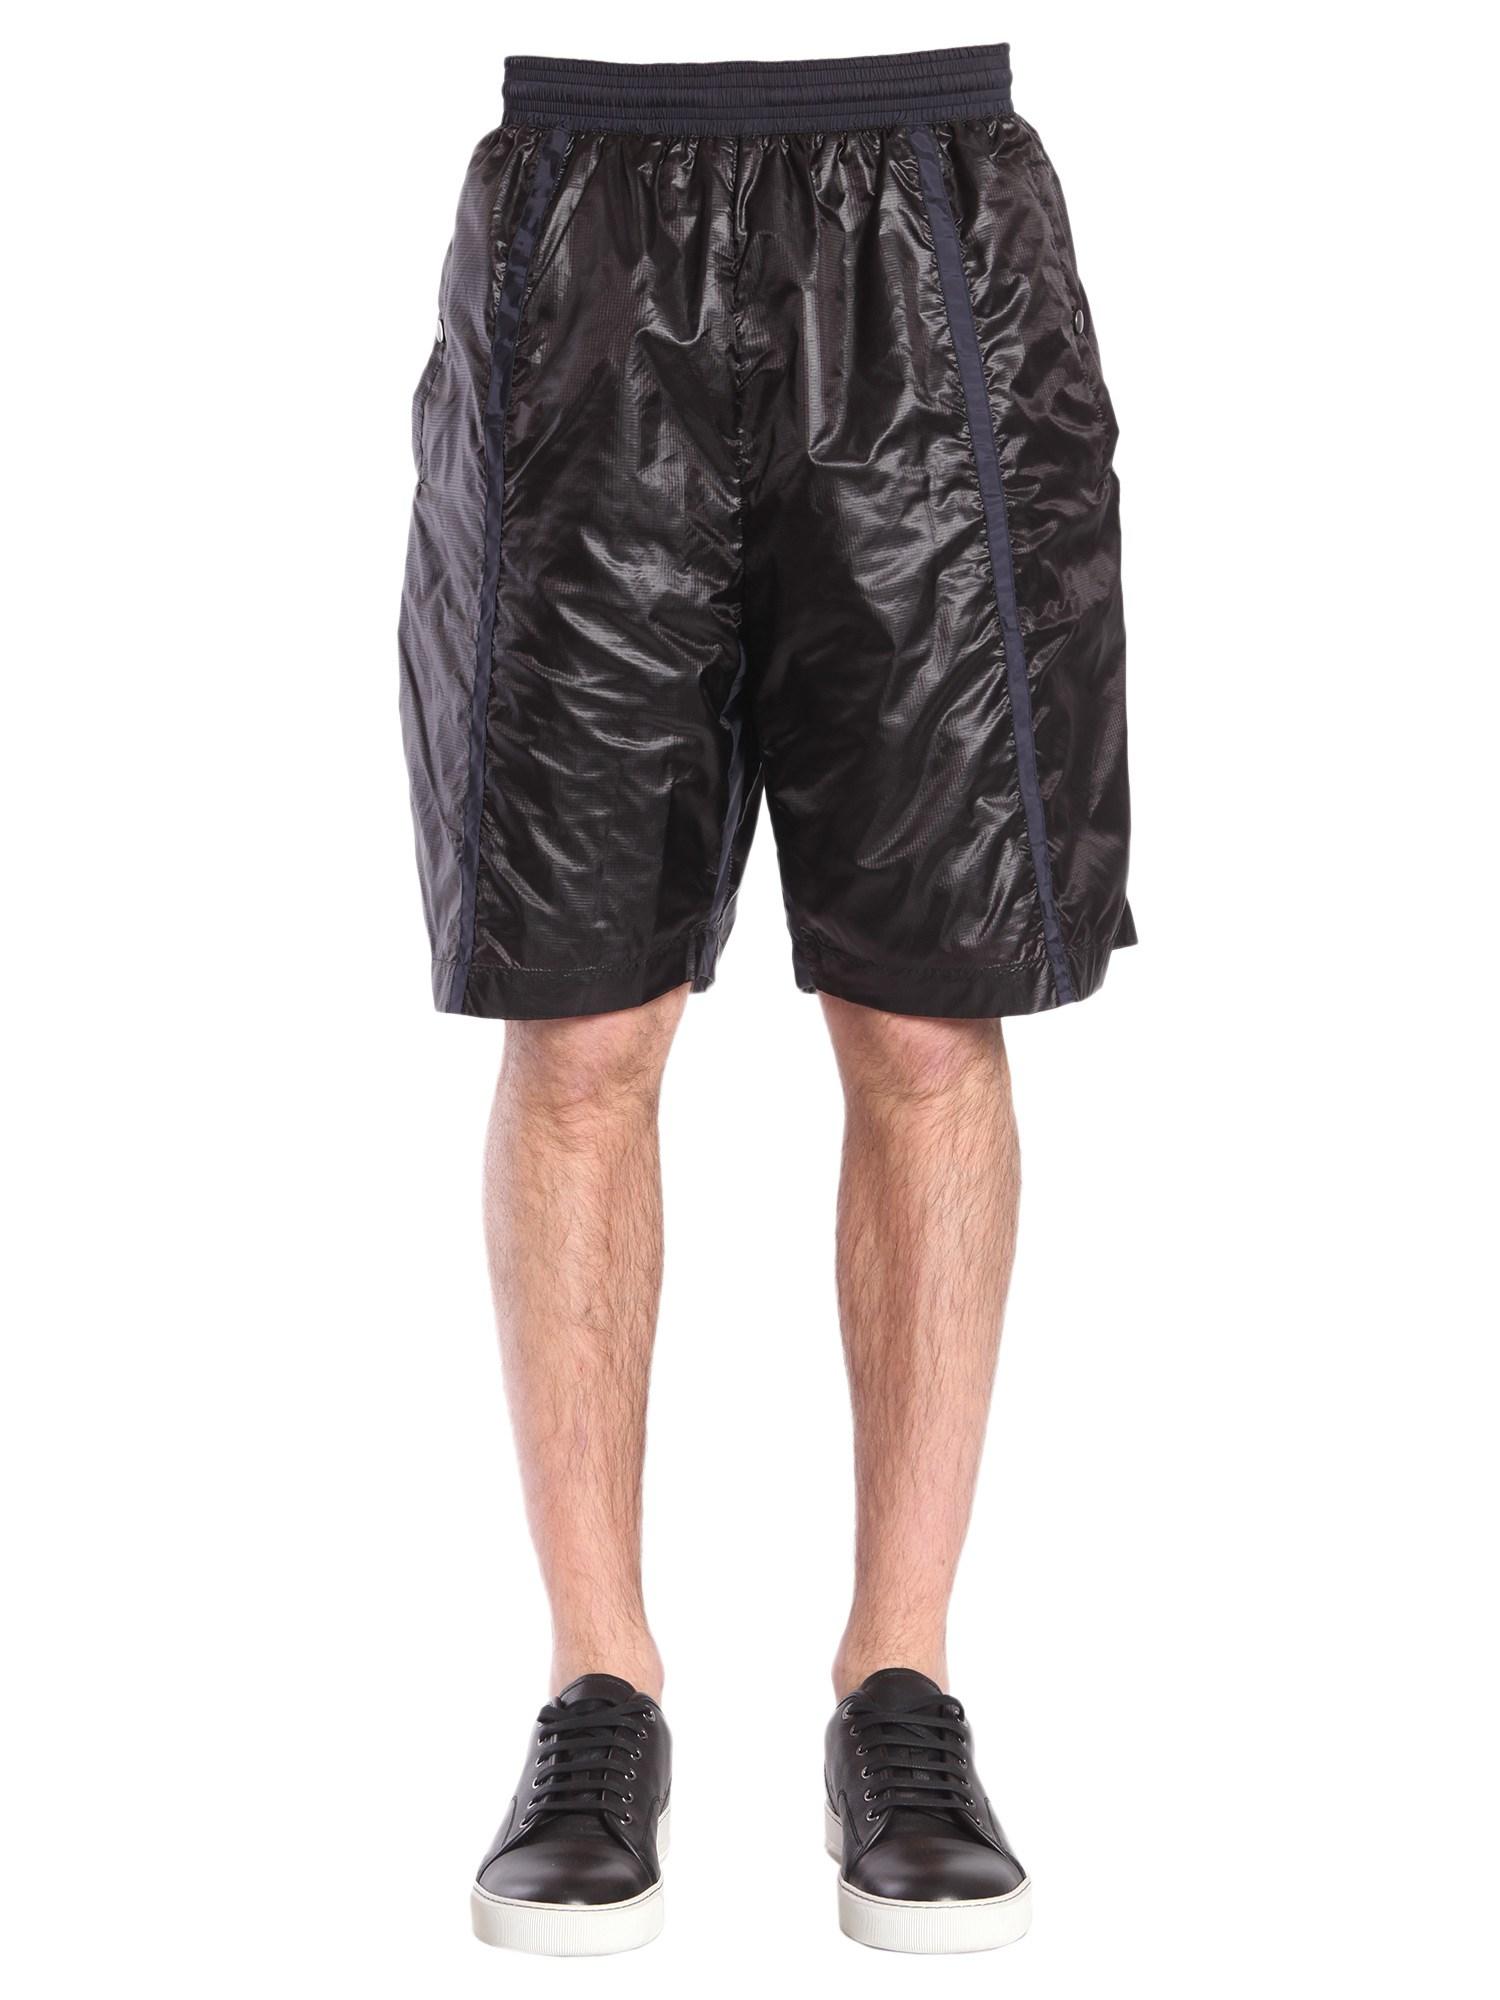 Diesel black gold pantastic shorts - diesel black gold - Modalova